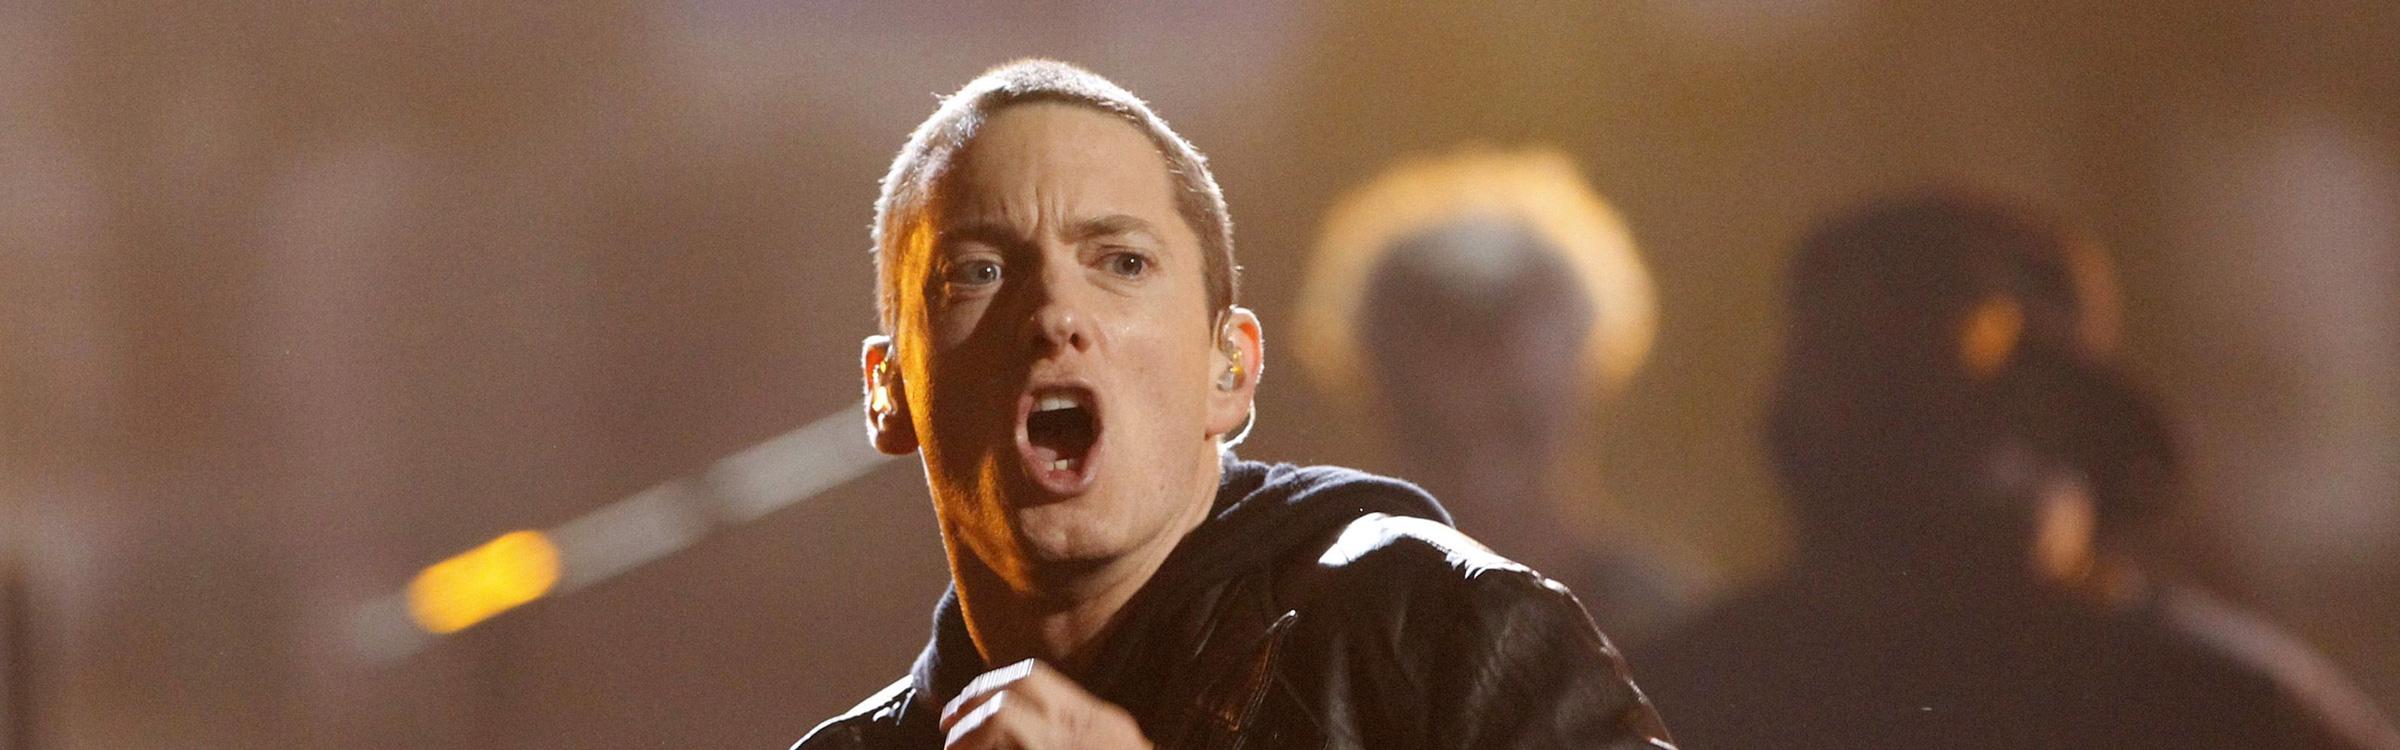 Eminem header